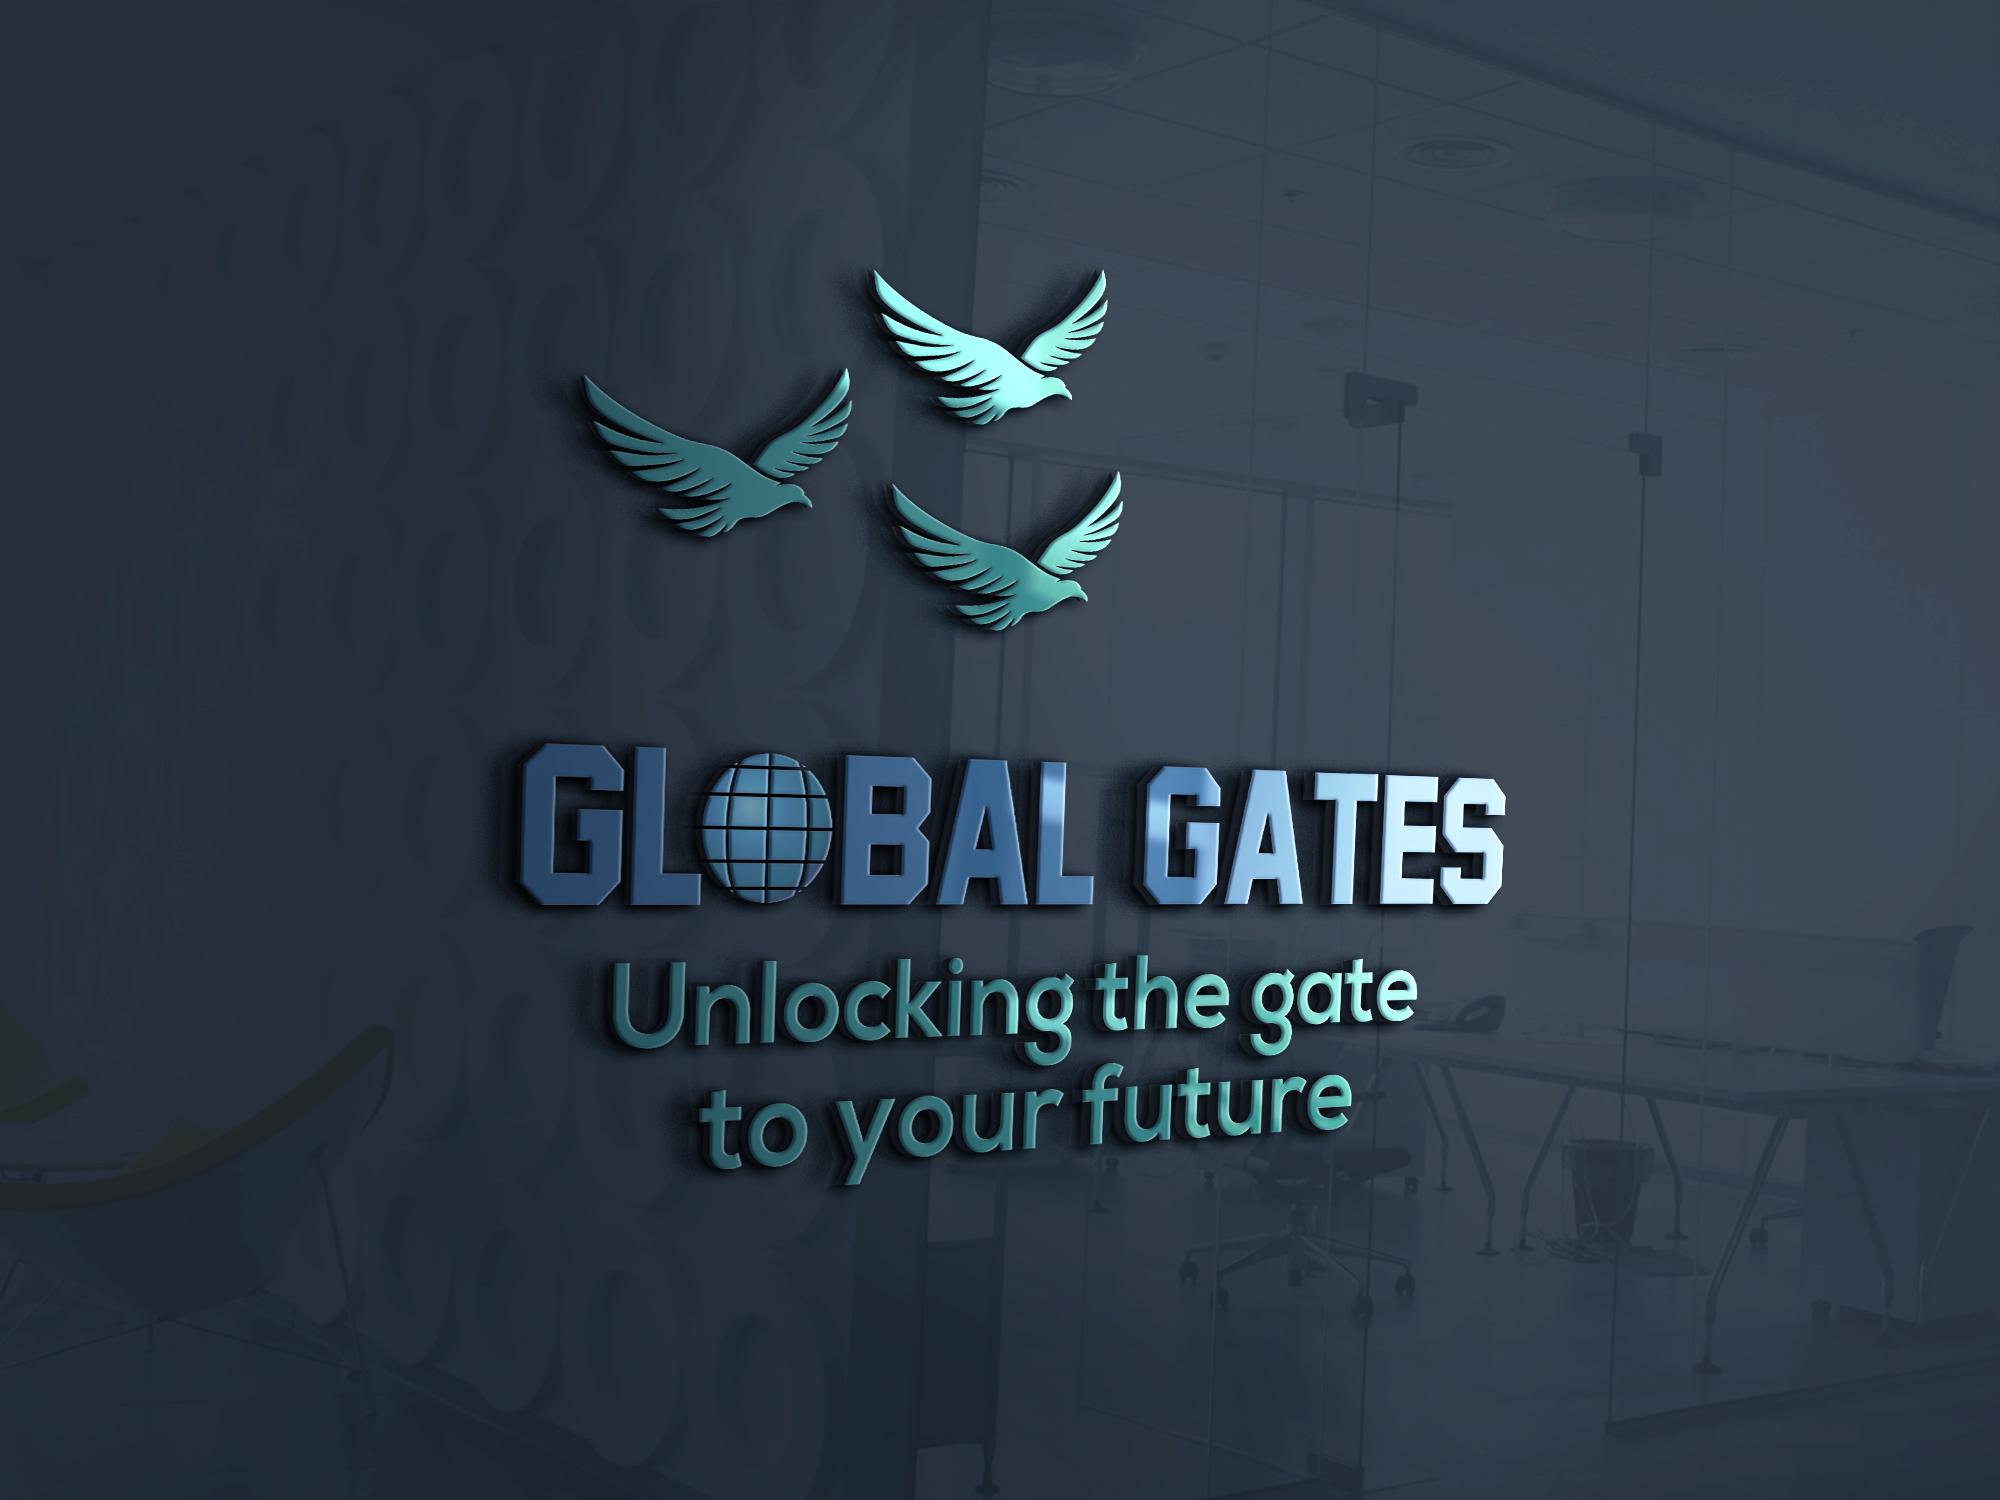 Global Gates